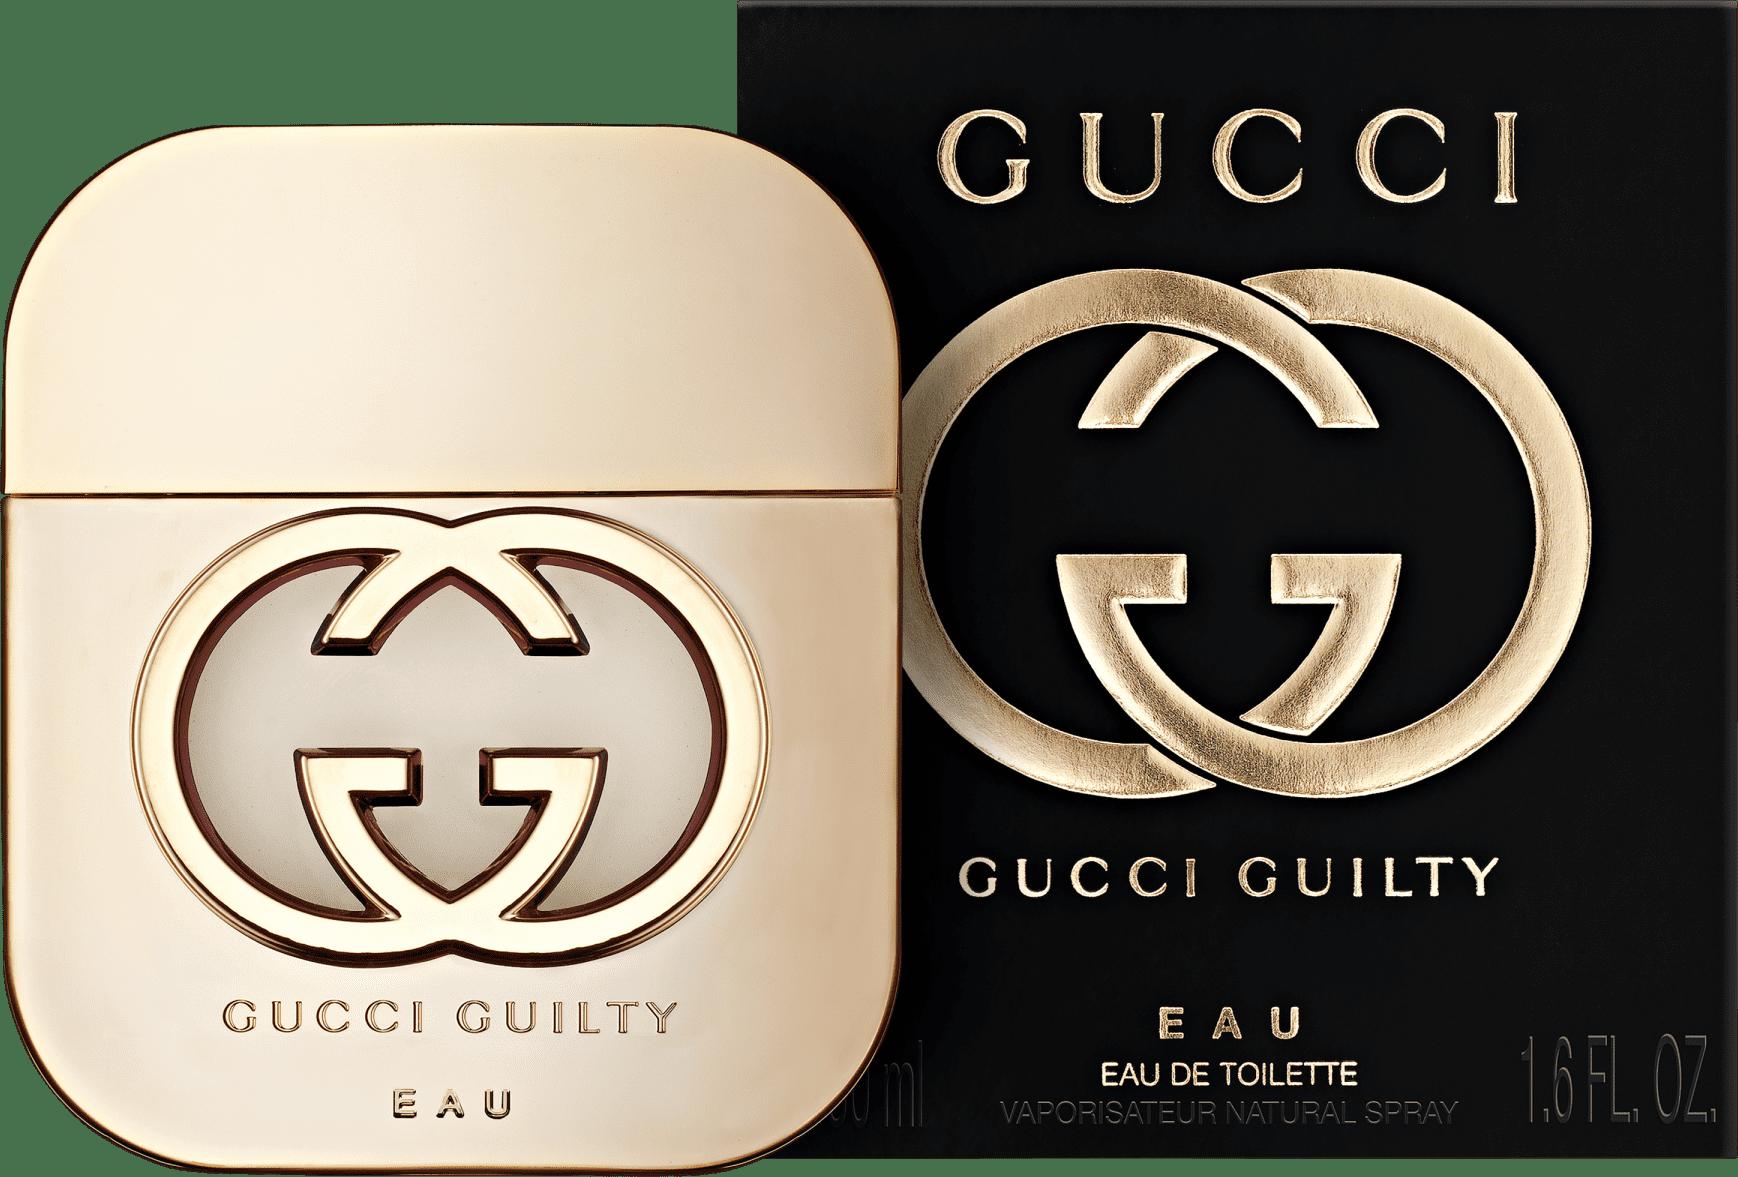 722e031c35b Gucci Guilty EAU Eau de Toilette - Perfume Feminino 50ml